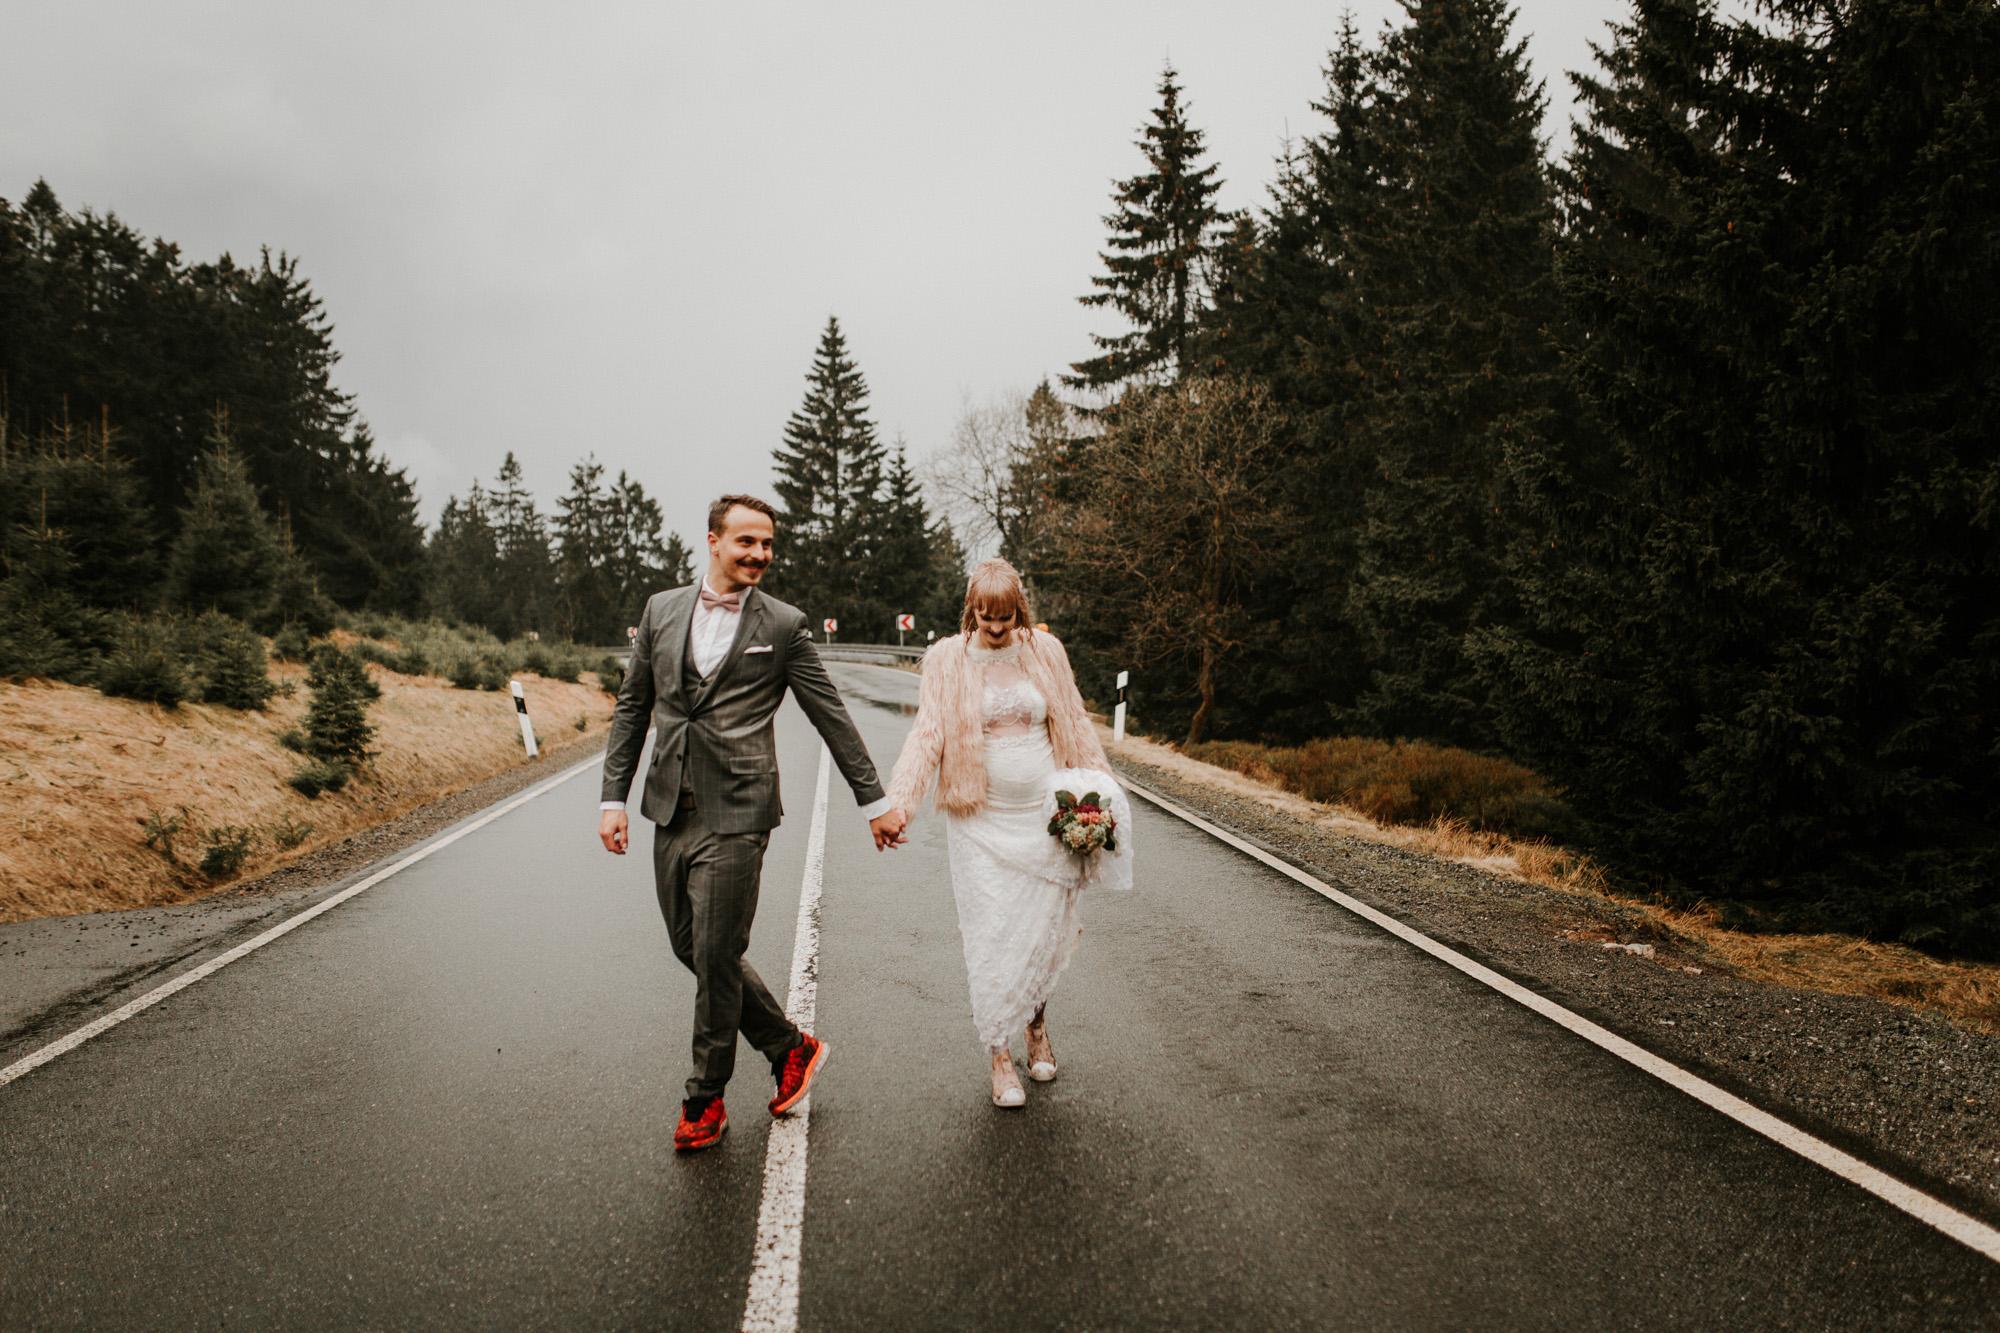 DanielaMarquardtPhotography_Hochzeitsfotograf_Düsseldorf_Köln_Mallorca_Bayern_Austria_Harz_LinaundMaik_Afterwedding-Shooting_Weddingphotographer_Ibiza_Tuskany_Italien_Toskana115